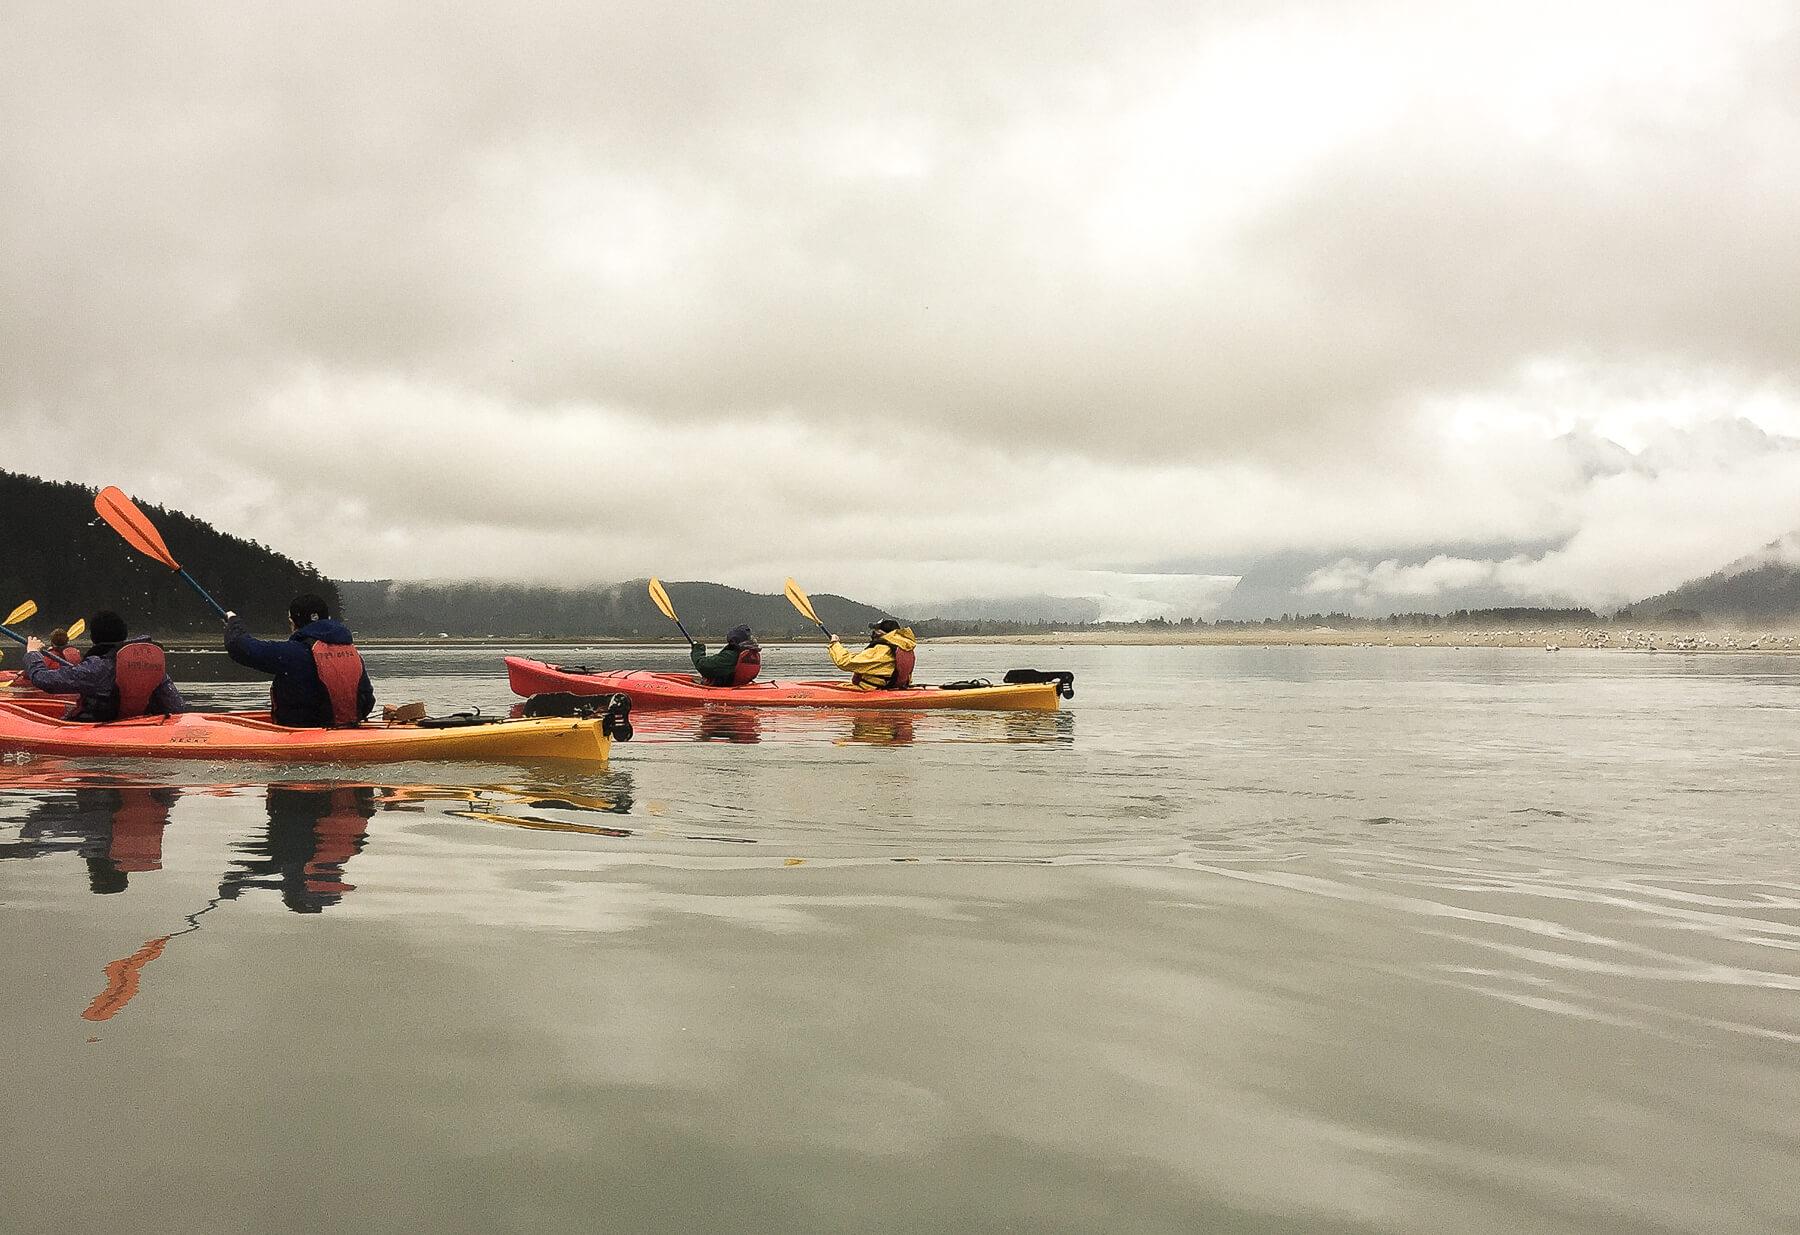 People paddling 2 Sea Kayaks through a still bay